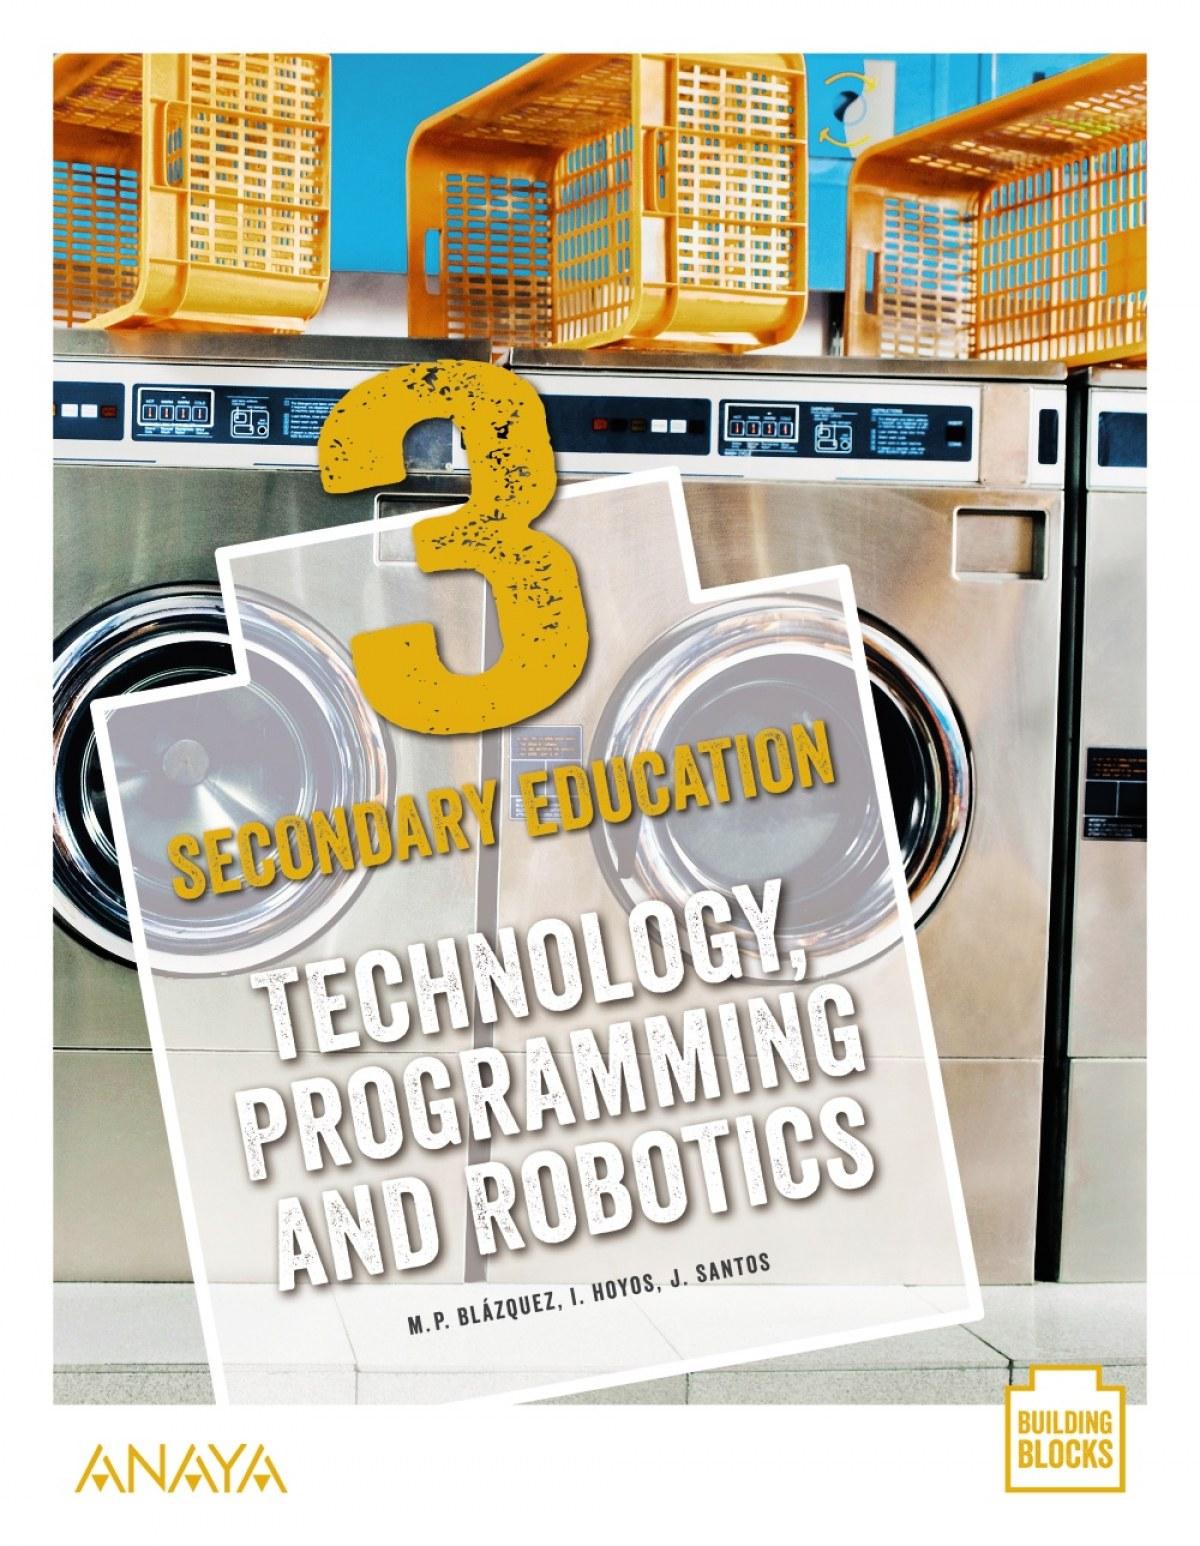 Technology, Programming and Robotics 3. Student's Book